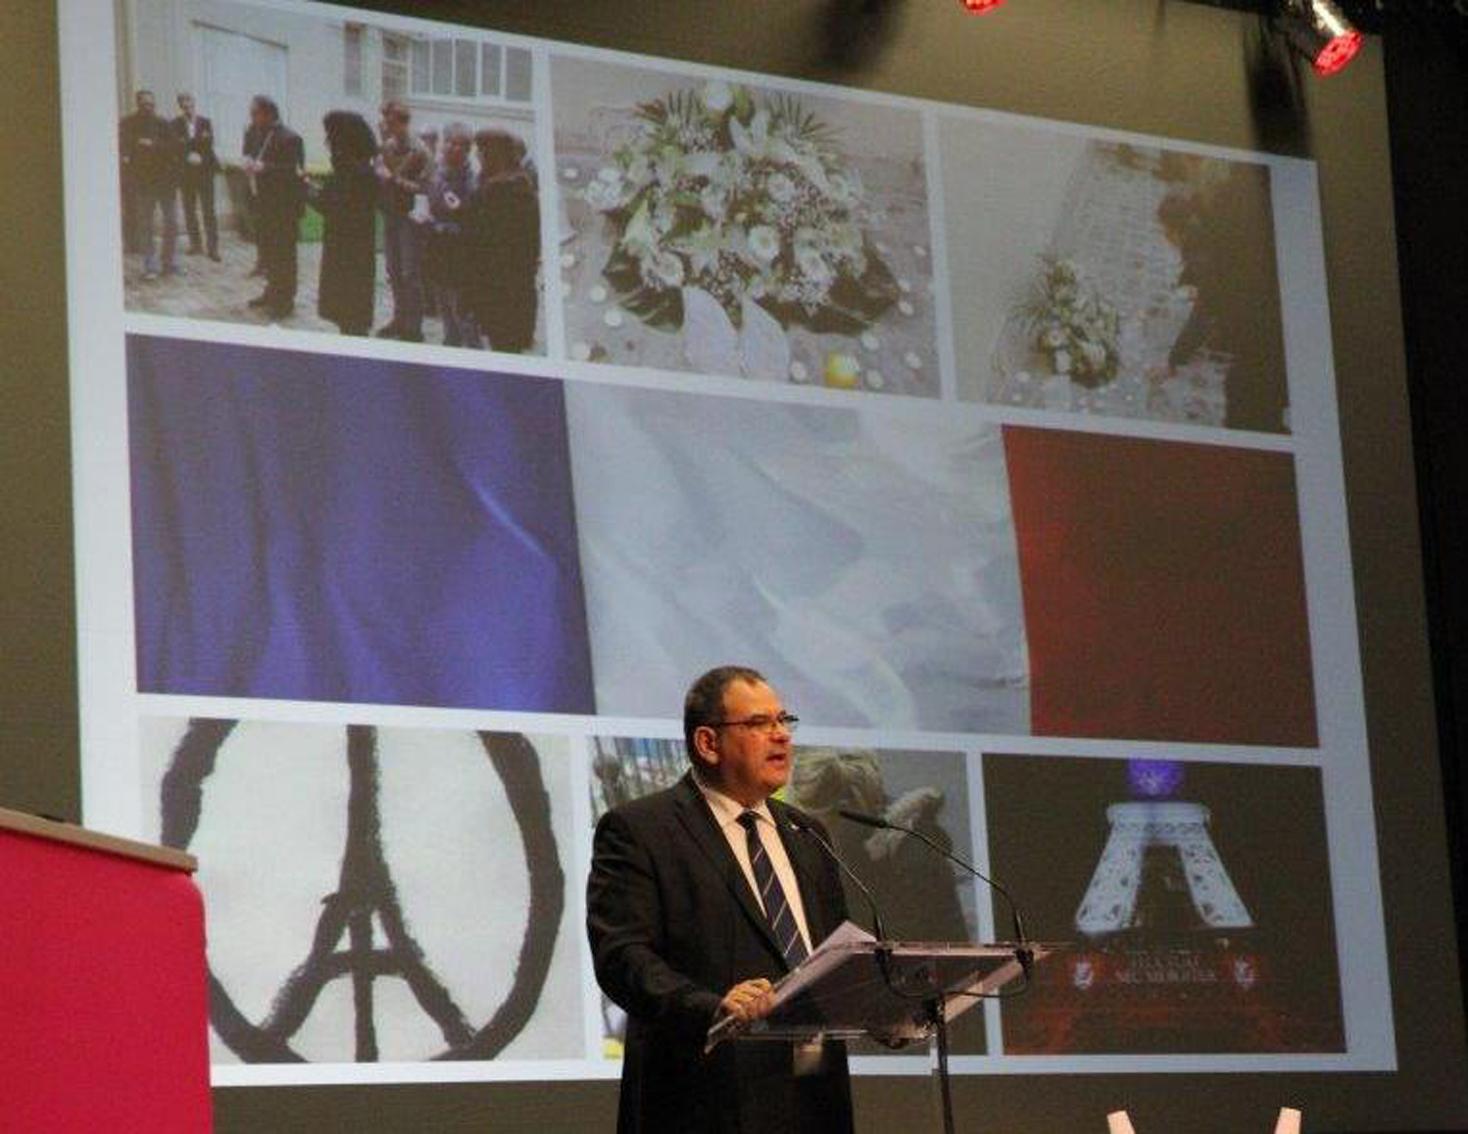 Christian babonneau evoquant les terribles attentas de novembre a paris 1